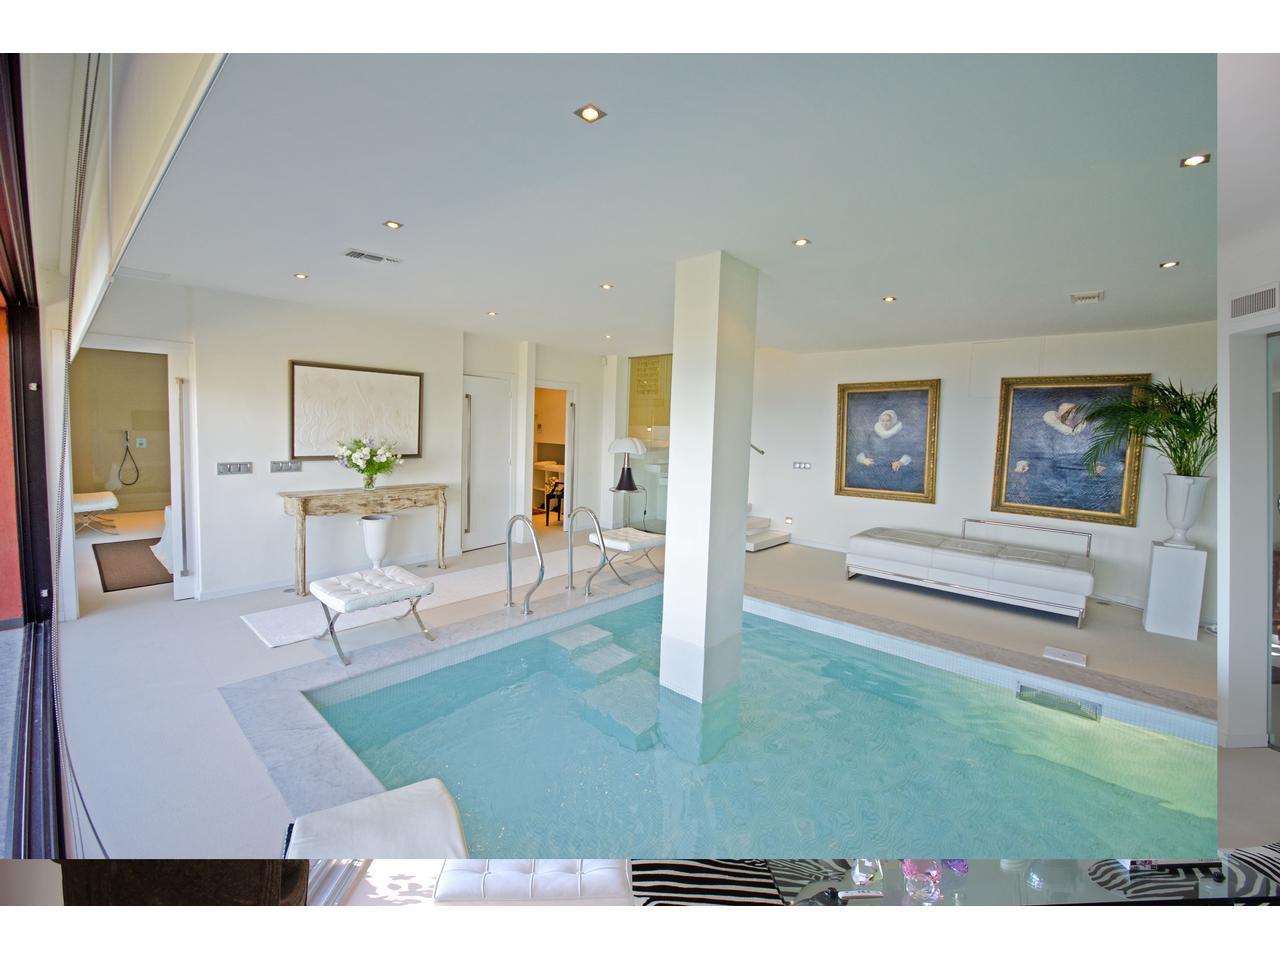 piscine intrieure maison prix excellent prix mini piscine. Black Bedroom Furniture Sets. Home Design Ideas